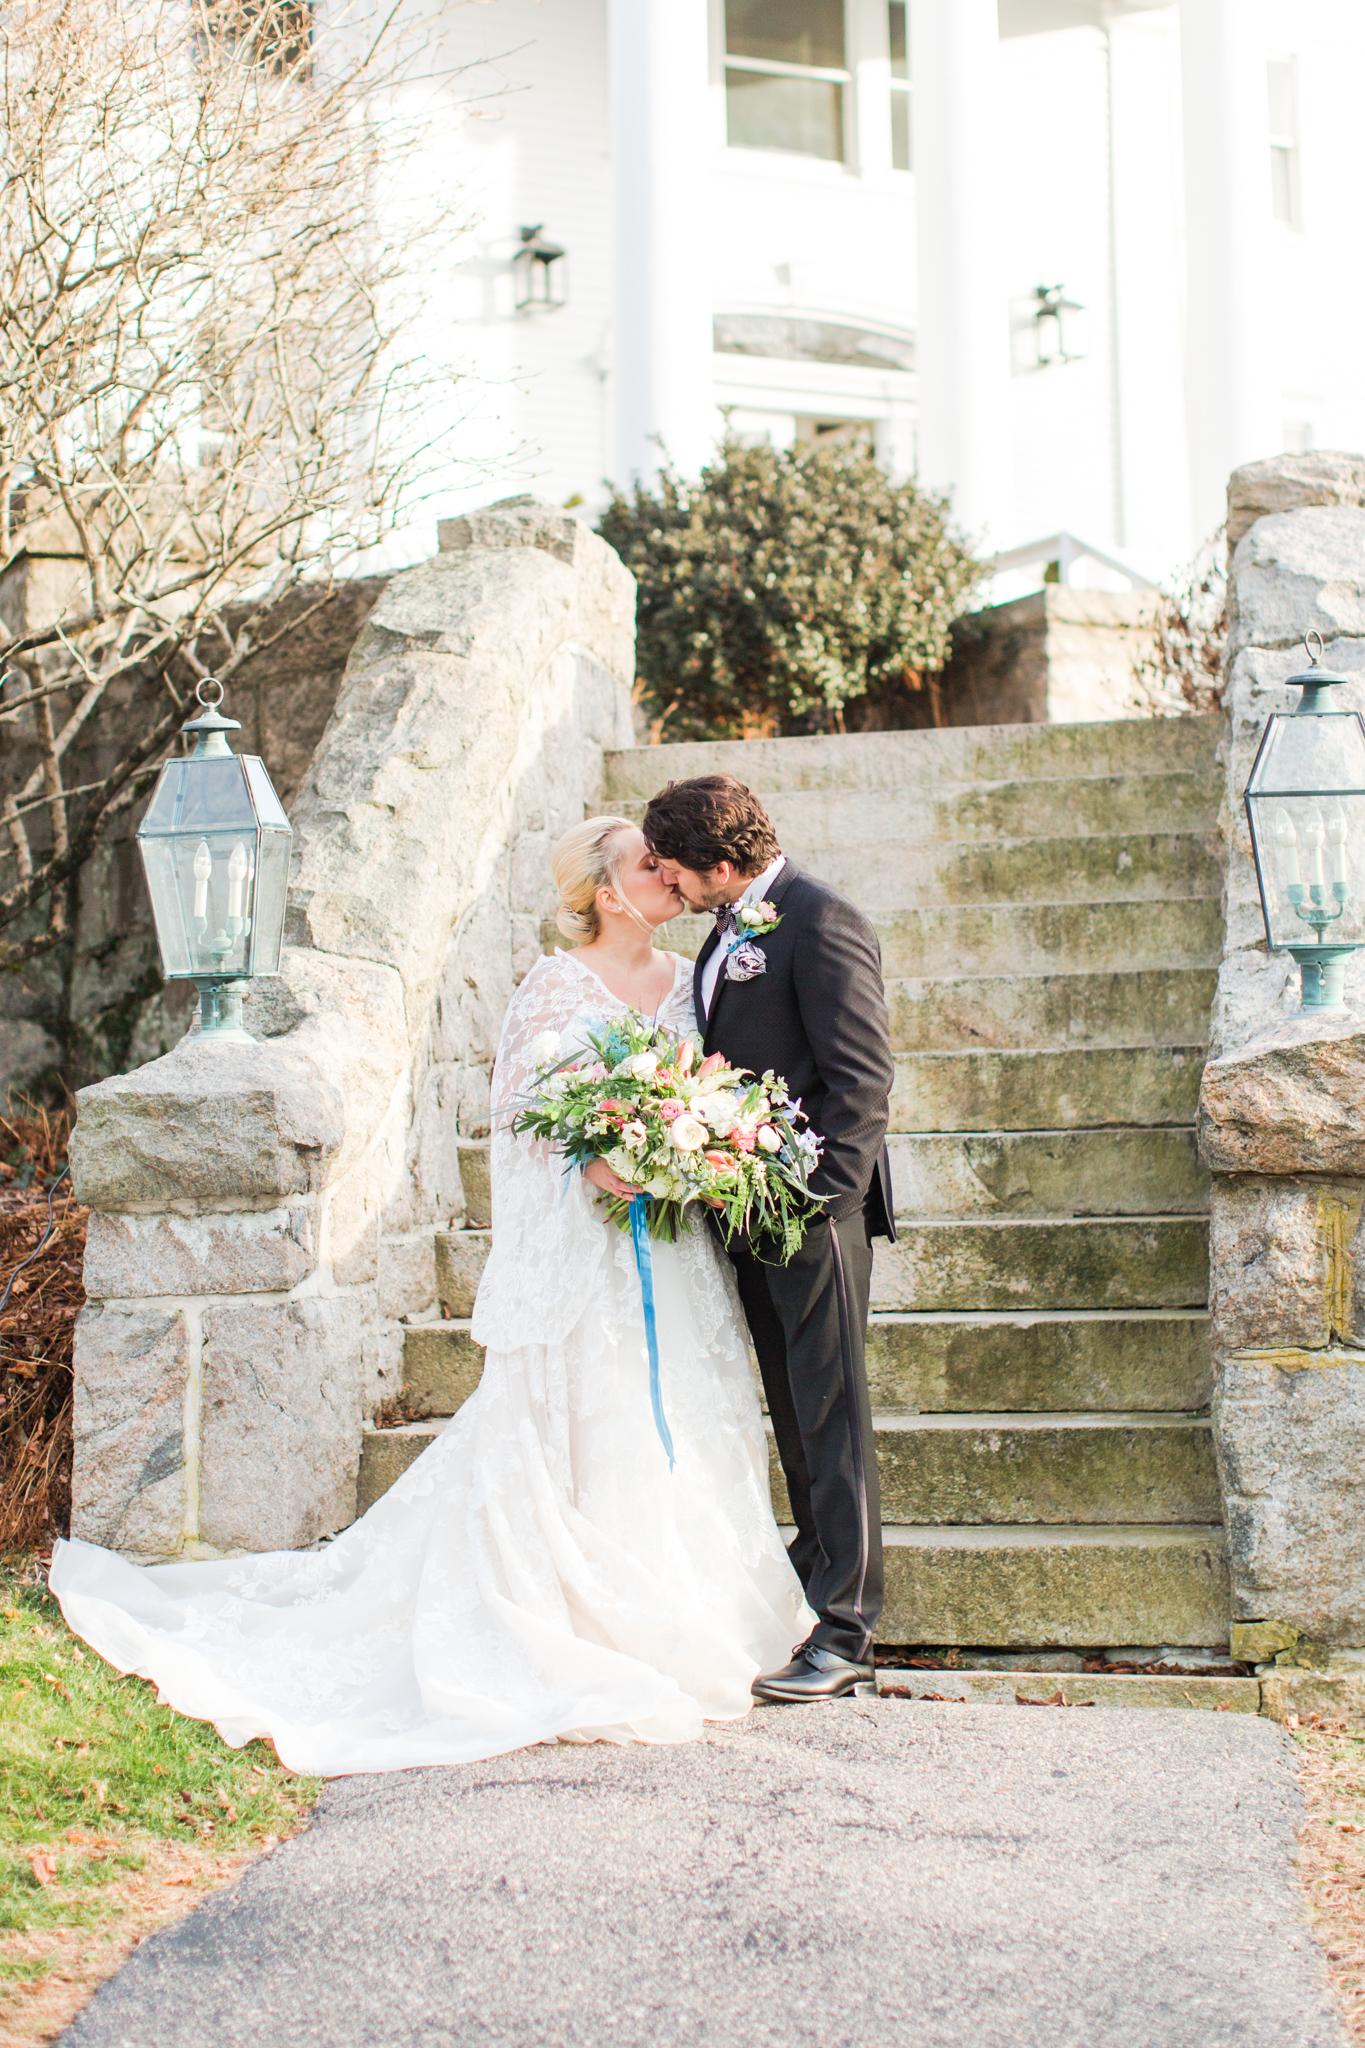 Haley Mansion Winter Wedding - Shaina Lee Photography-290.jpg